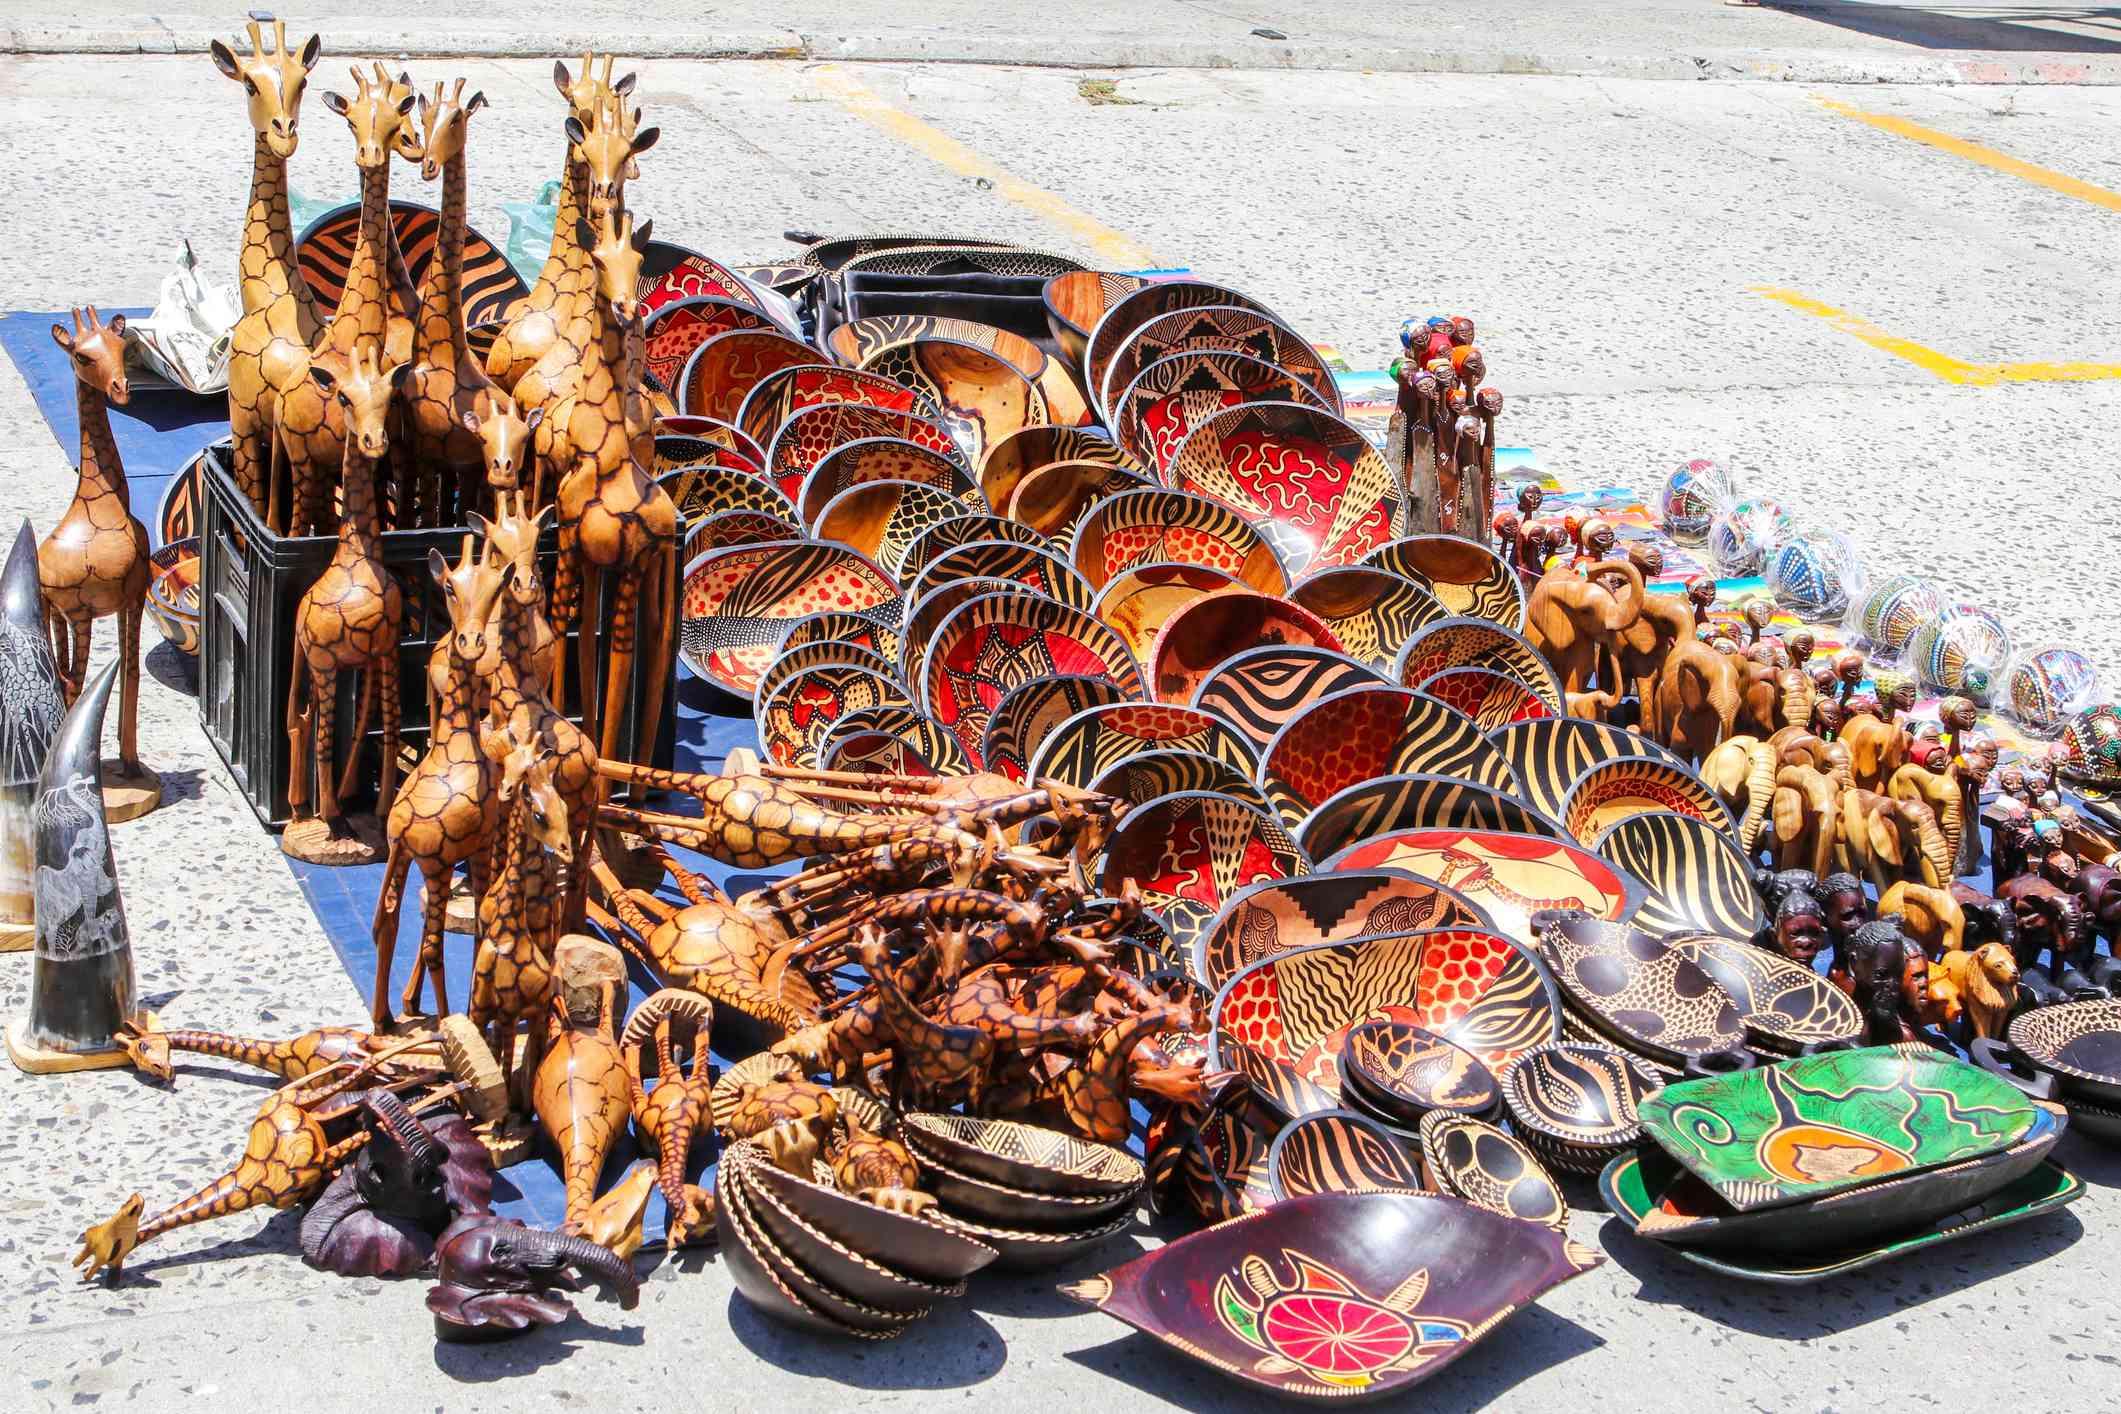 African curios at an open-air market